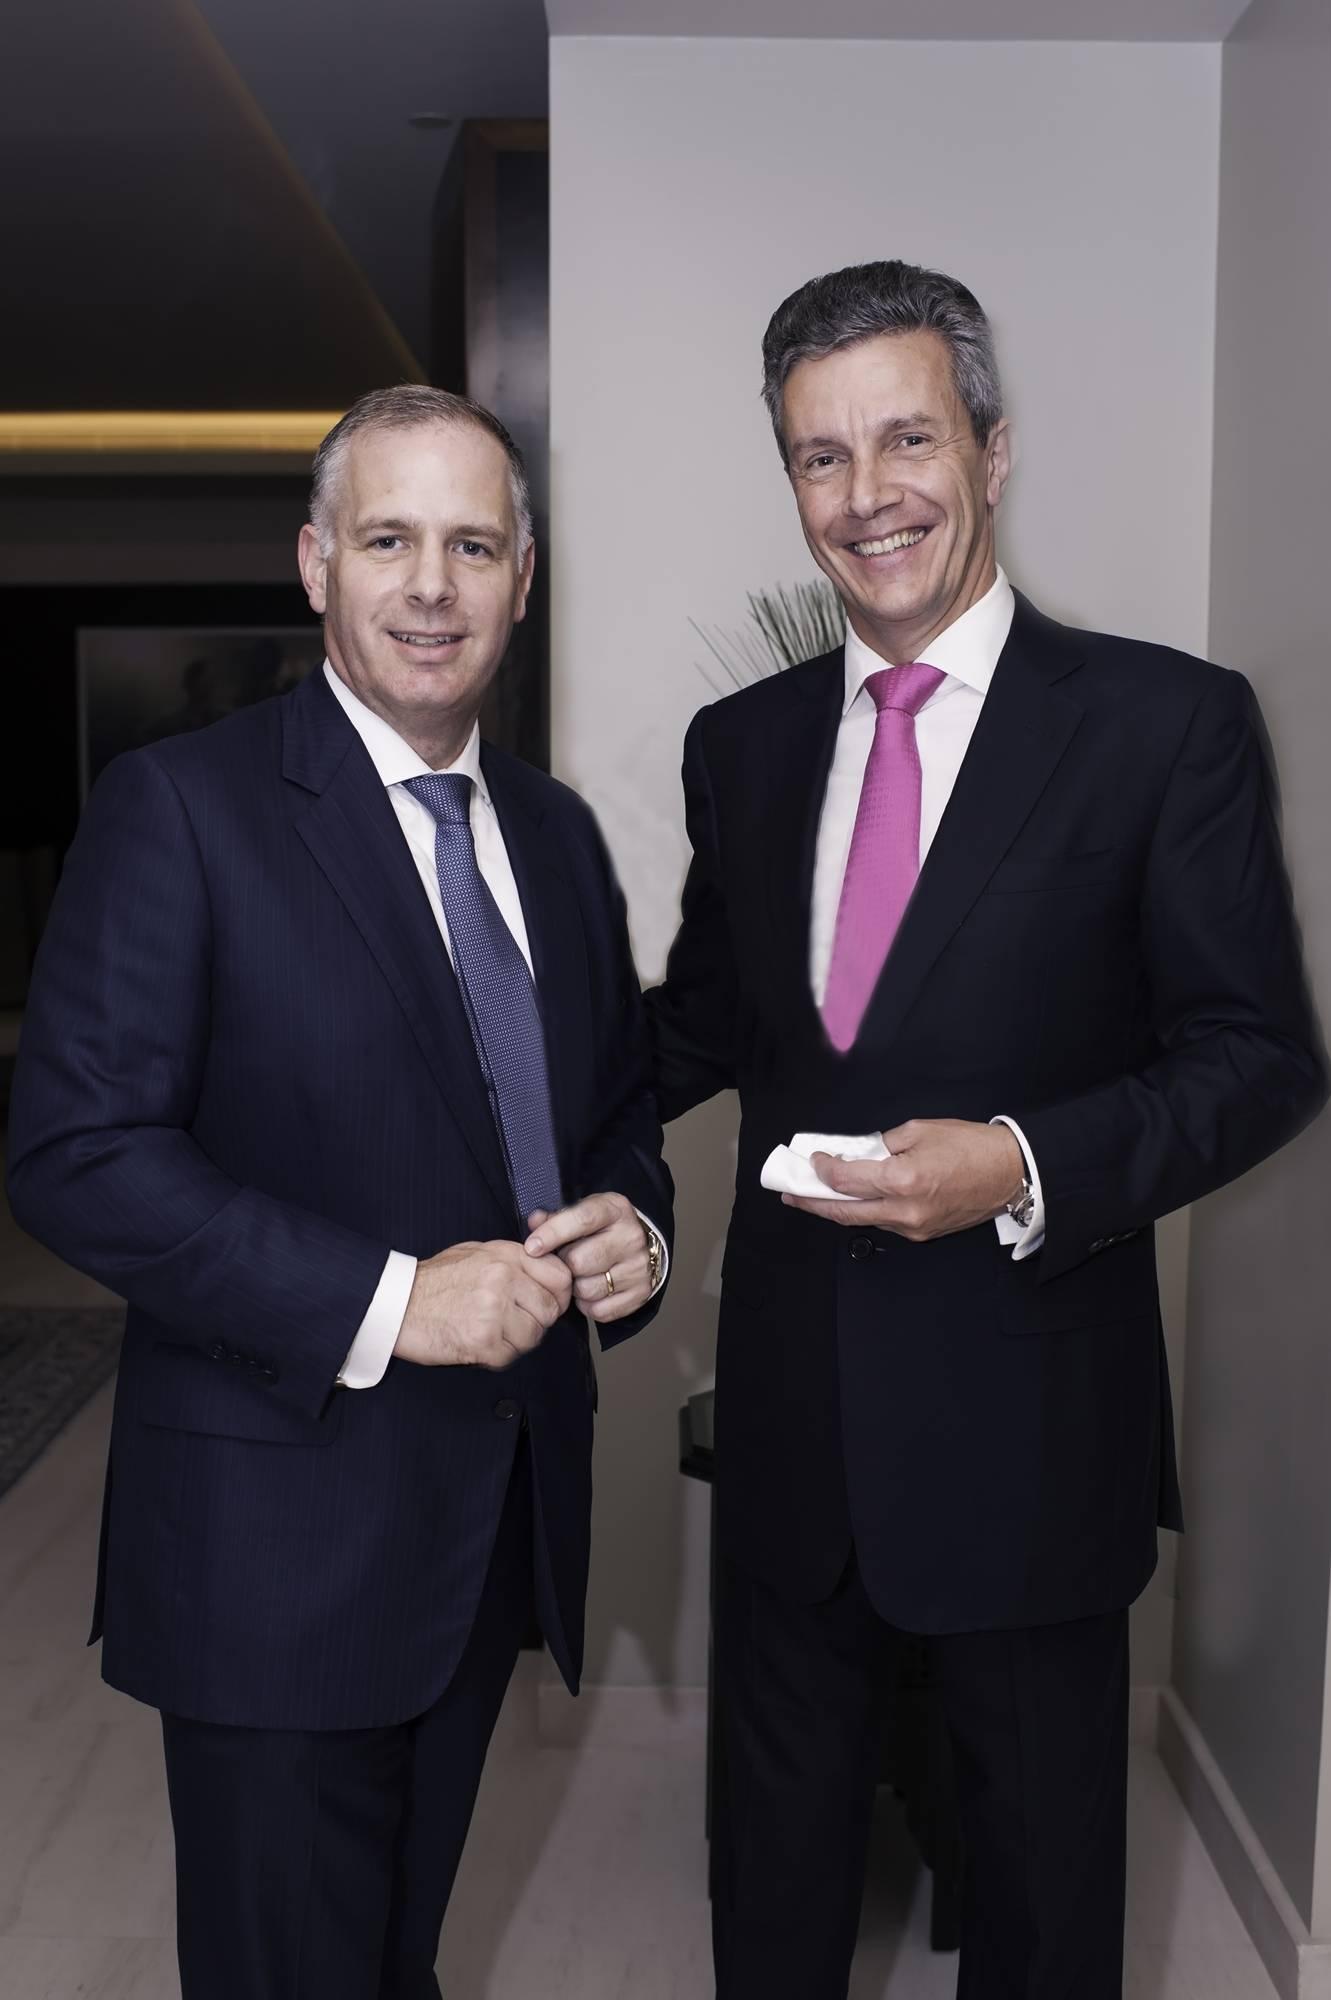 Park Hyatt Dubai's GM Adrian Slater and Jaeger-LeCoultre's CEO Daniel Riedo copy